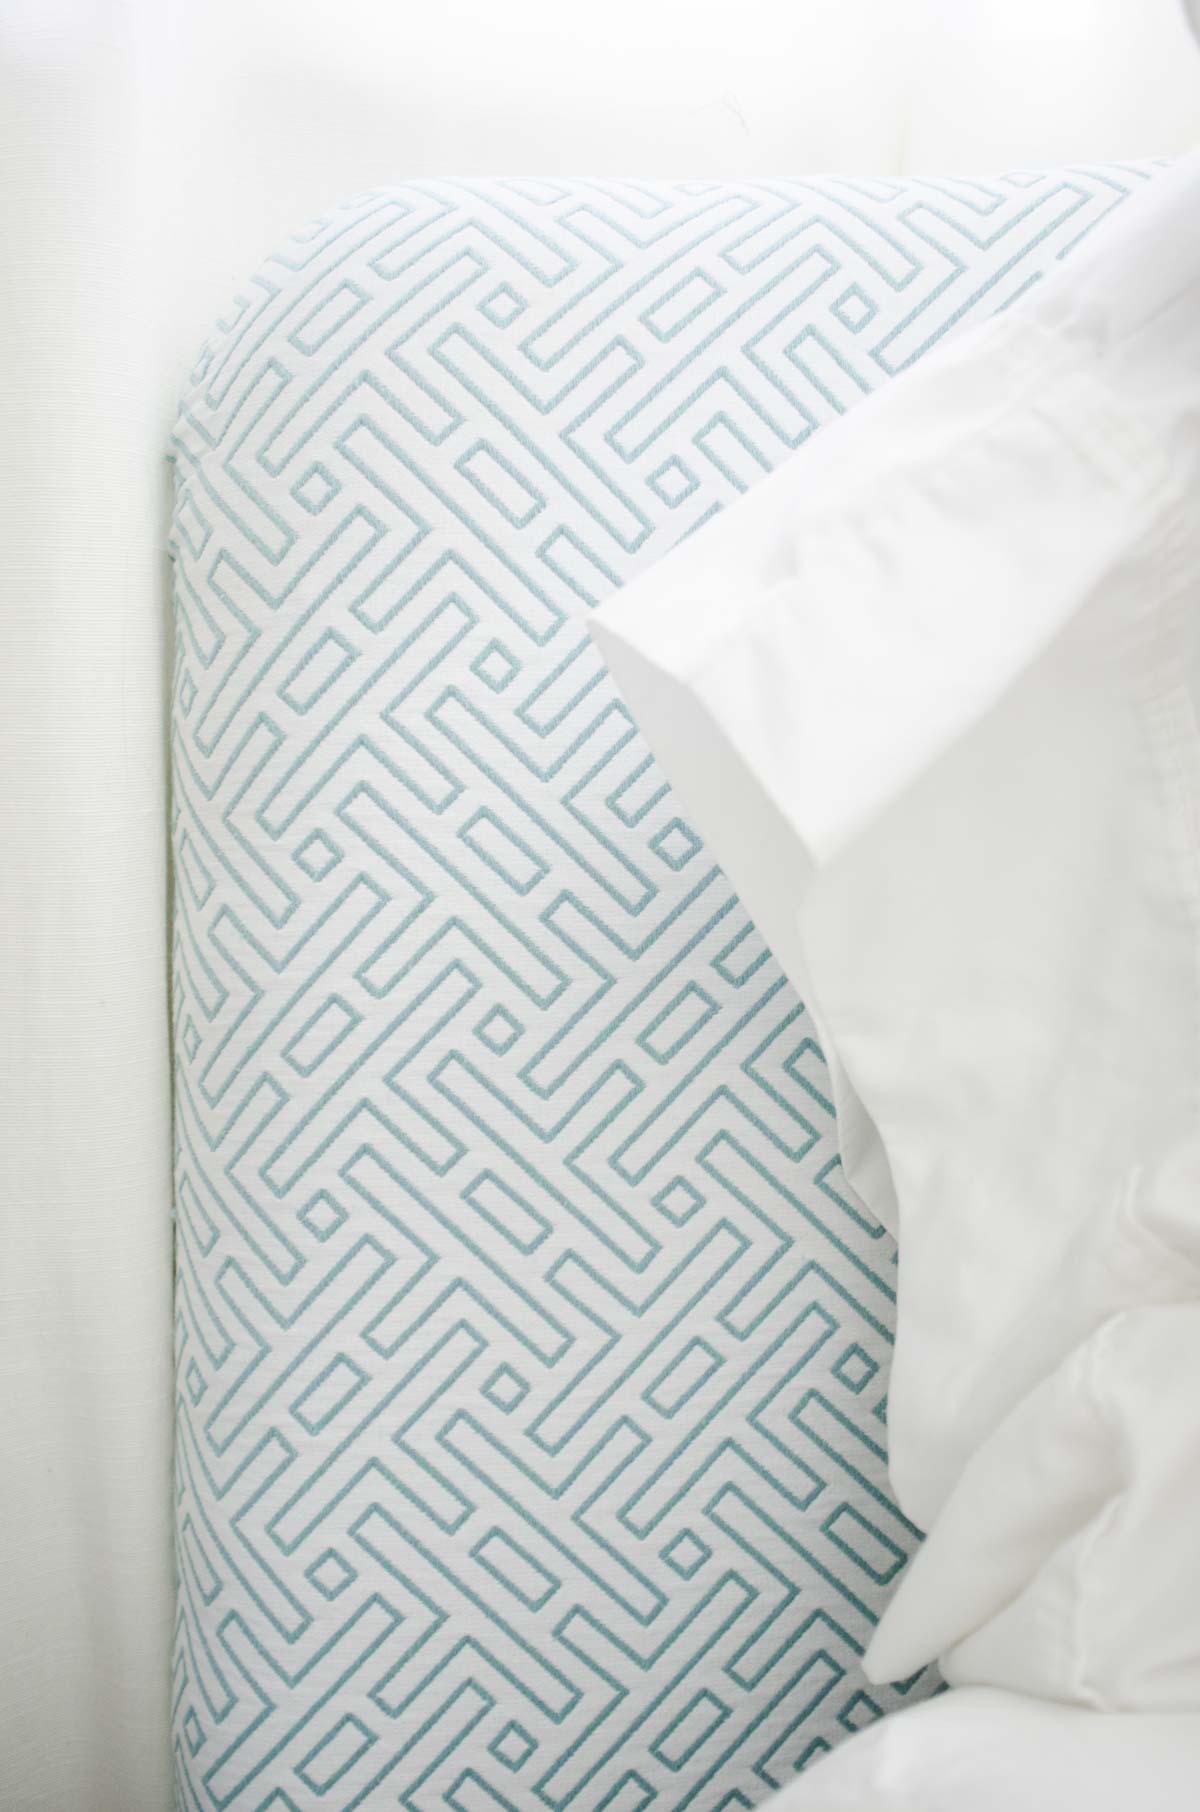 Modern blue and white pattern fabric headboard via @thouswellblog